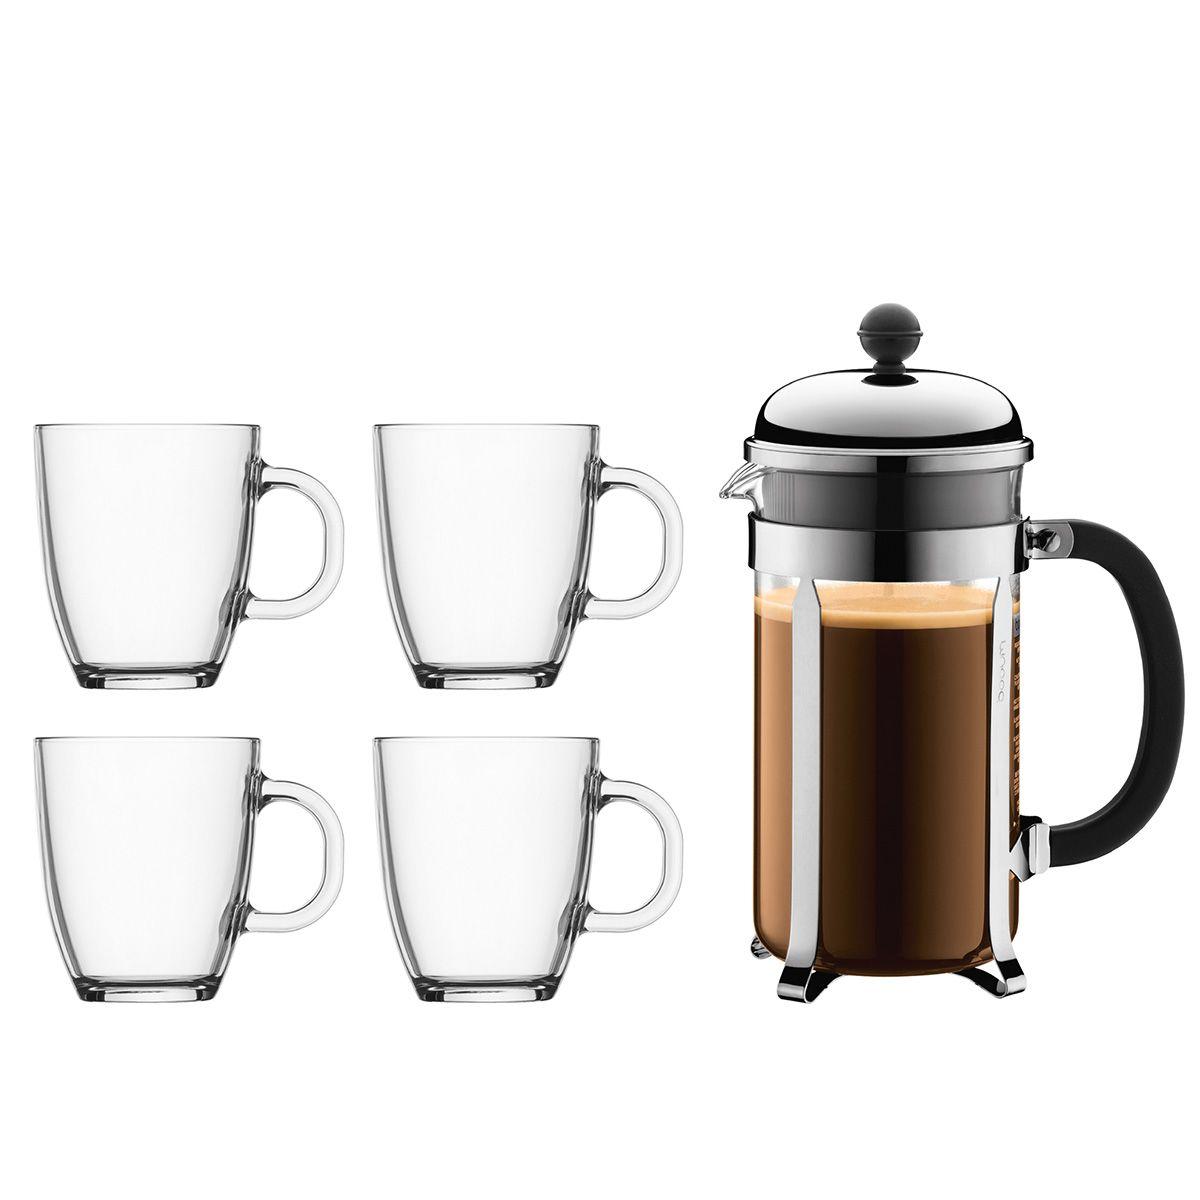 French Press Coffee Maker Glass Mug CHAMBORD BISTRO Bodum